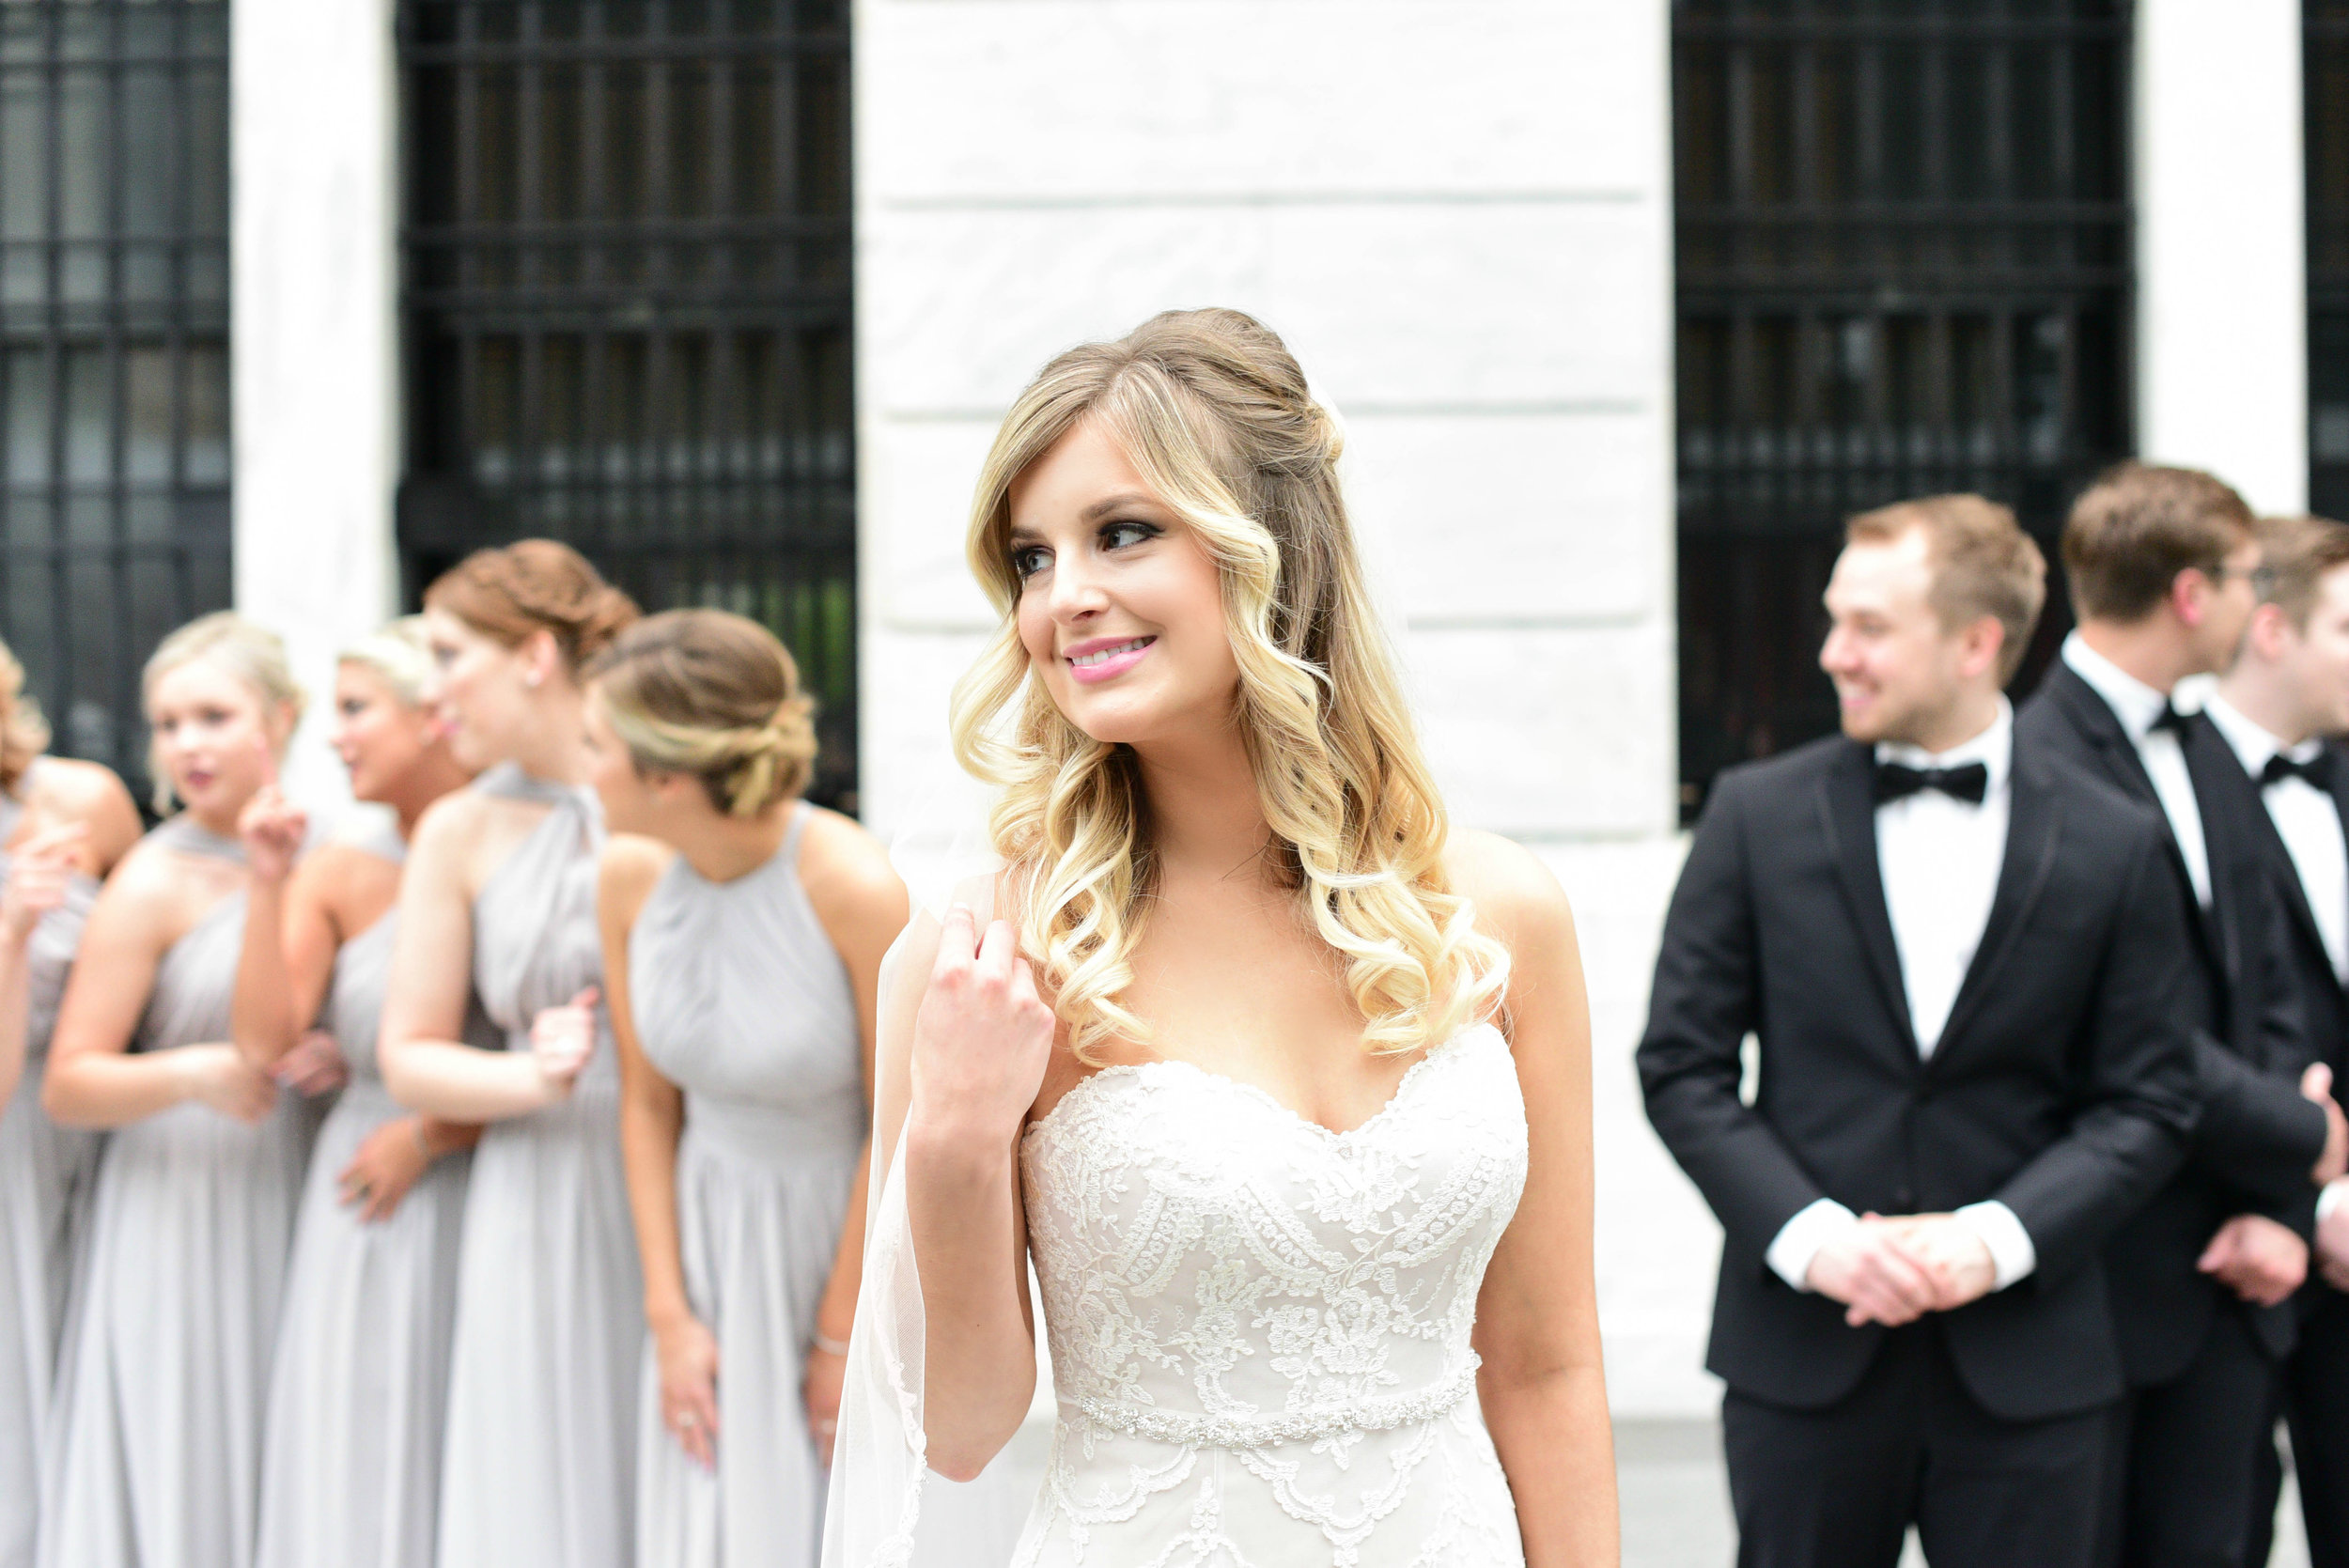 Dustin Rachel Cleveland Wedding 13.jpg